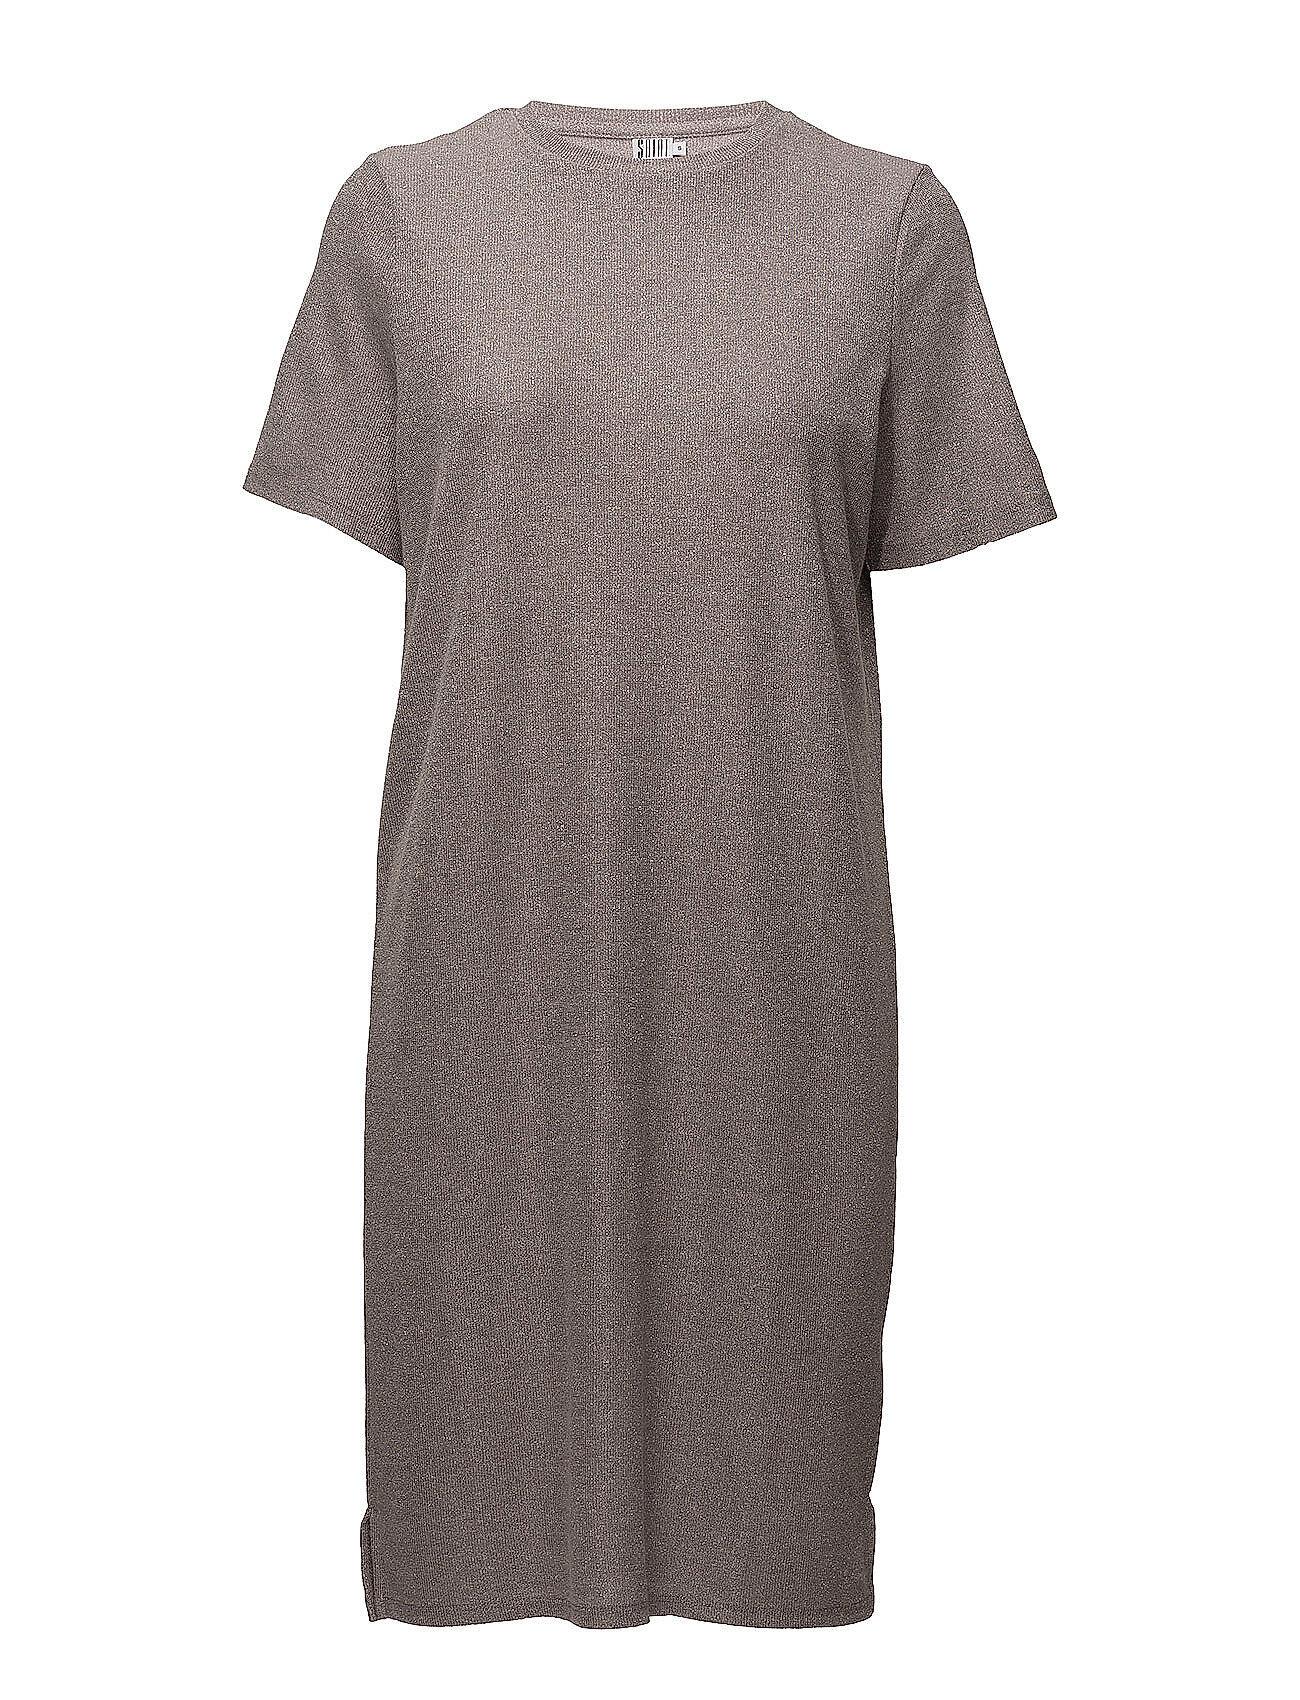 Saint Tropez Shimmer Knit Dress W. Slits Lyhyt Mekko Harmaa Saint Tropez